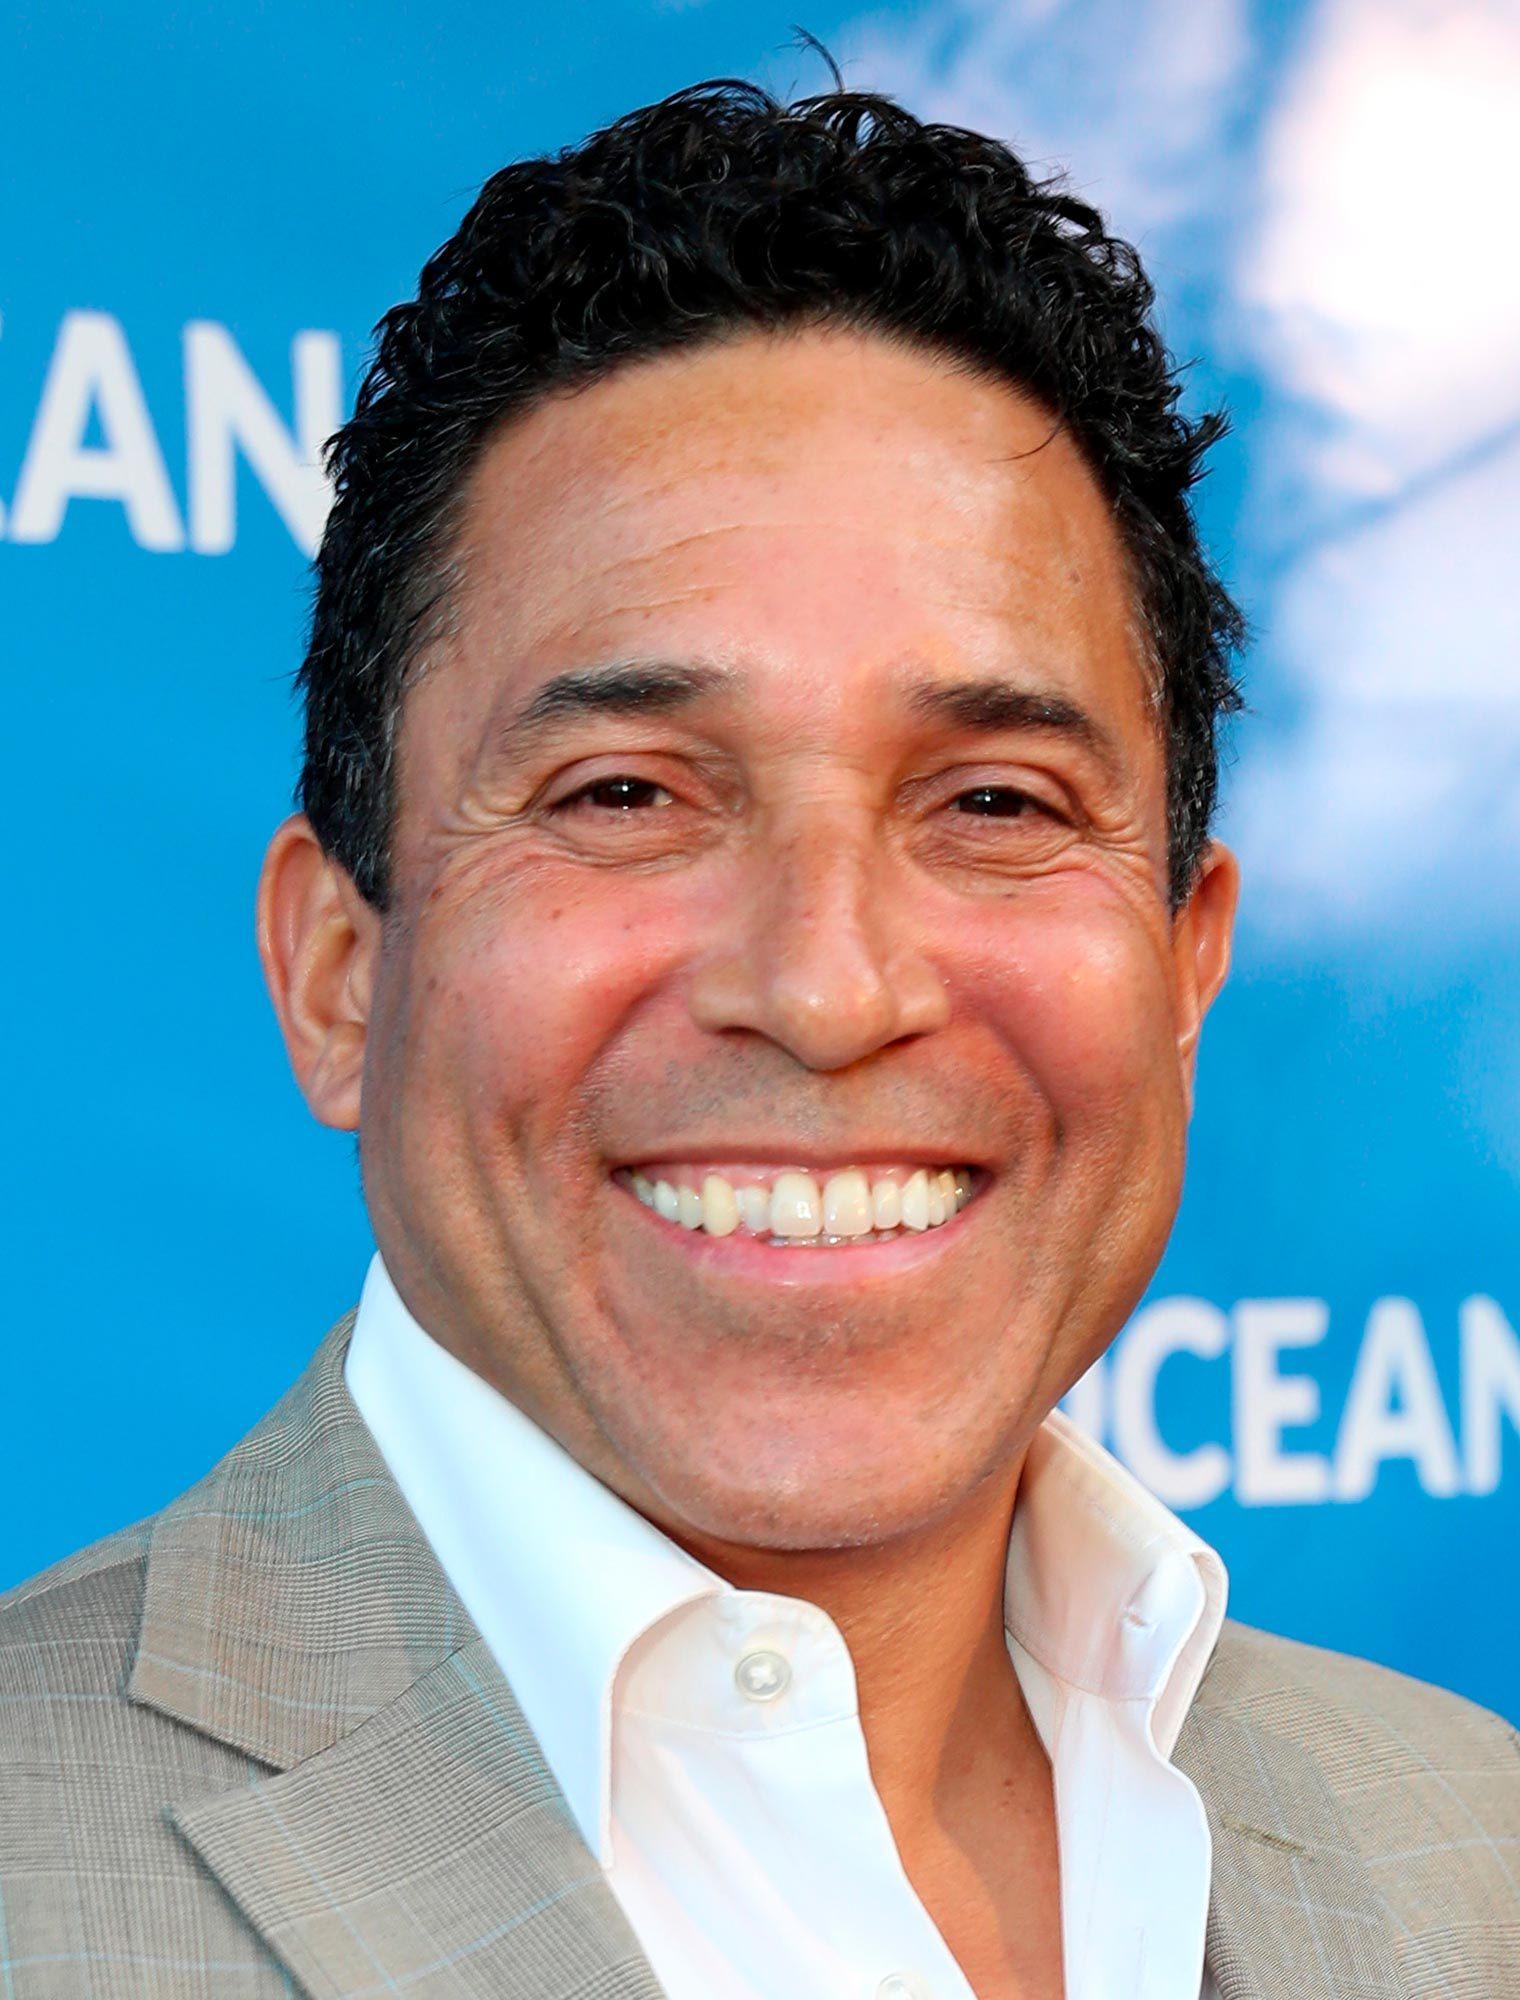 Oscar Nunez